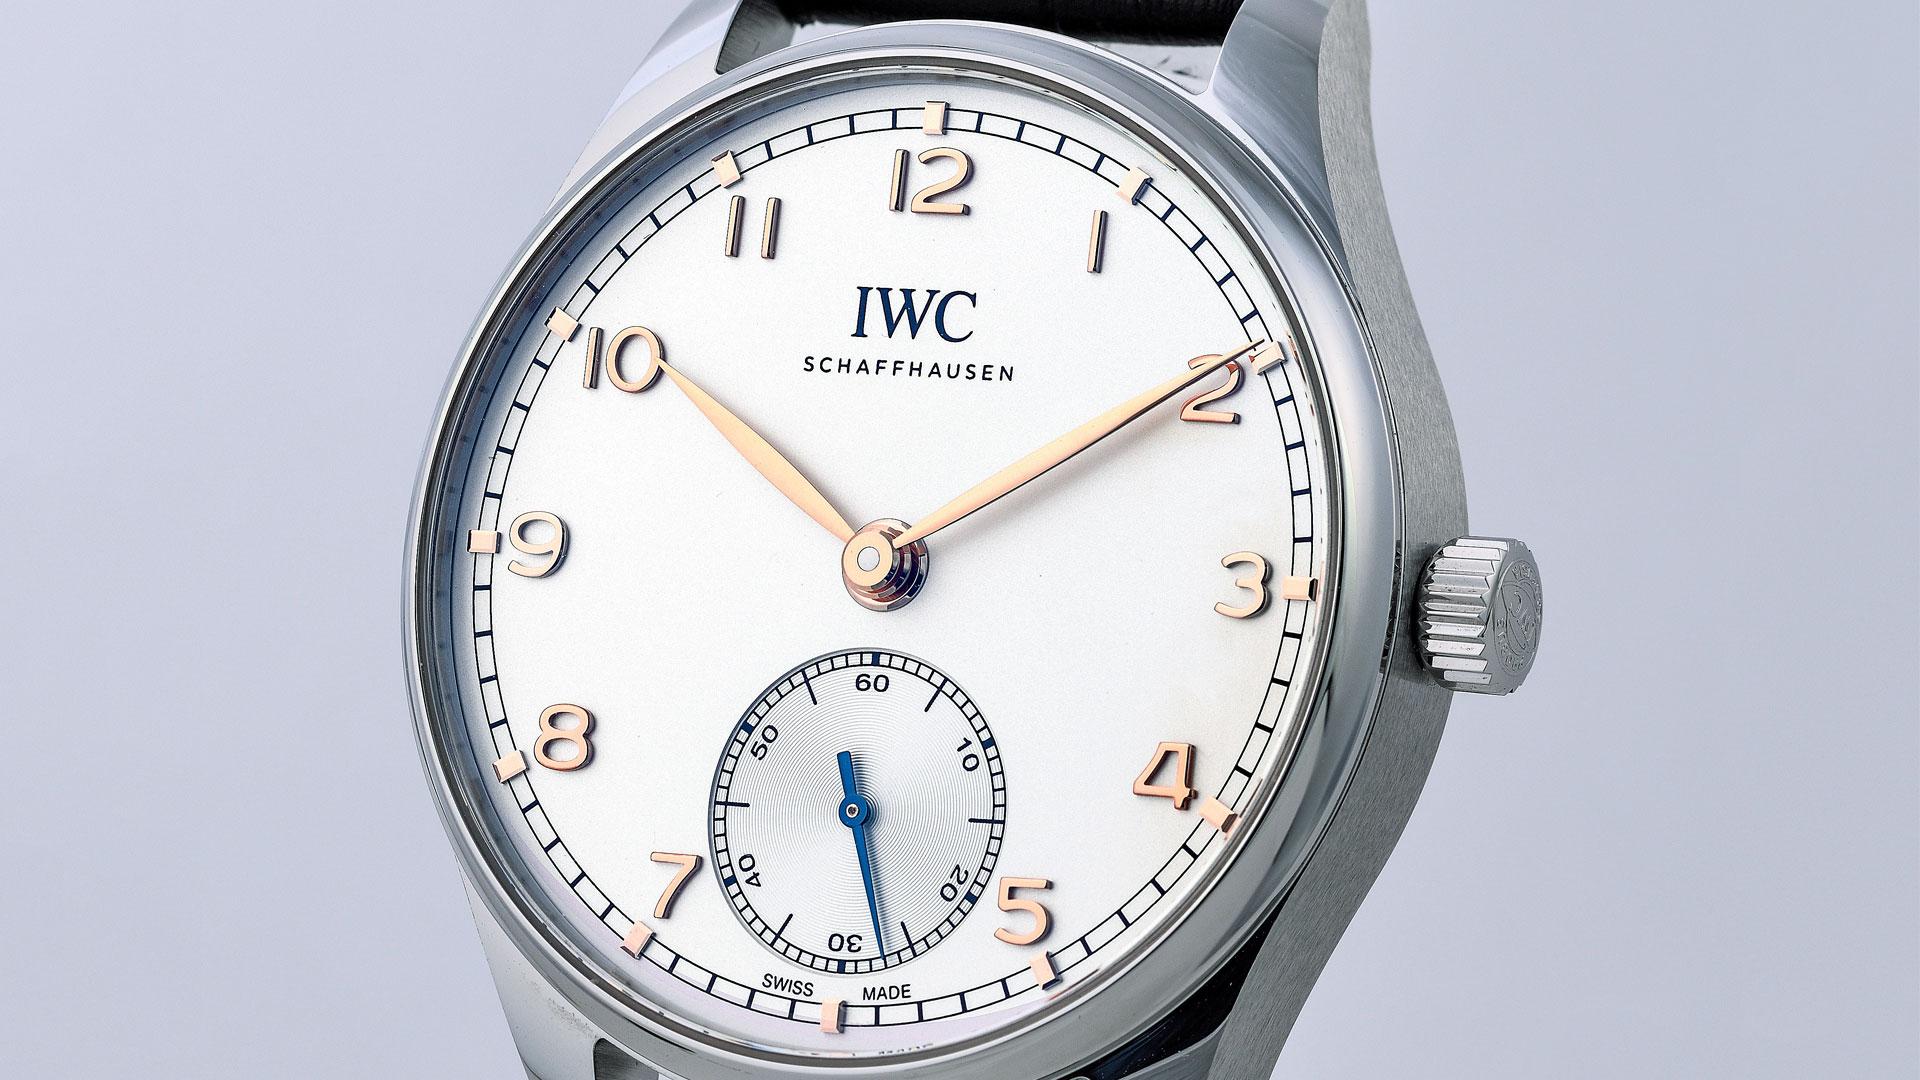 IWC-bella-figura